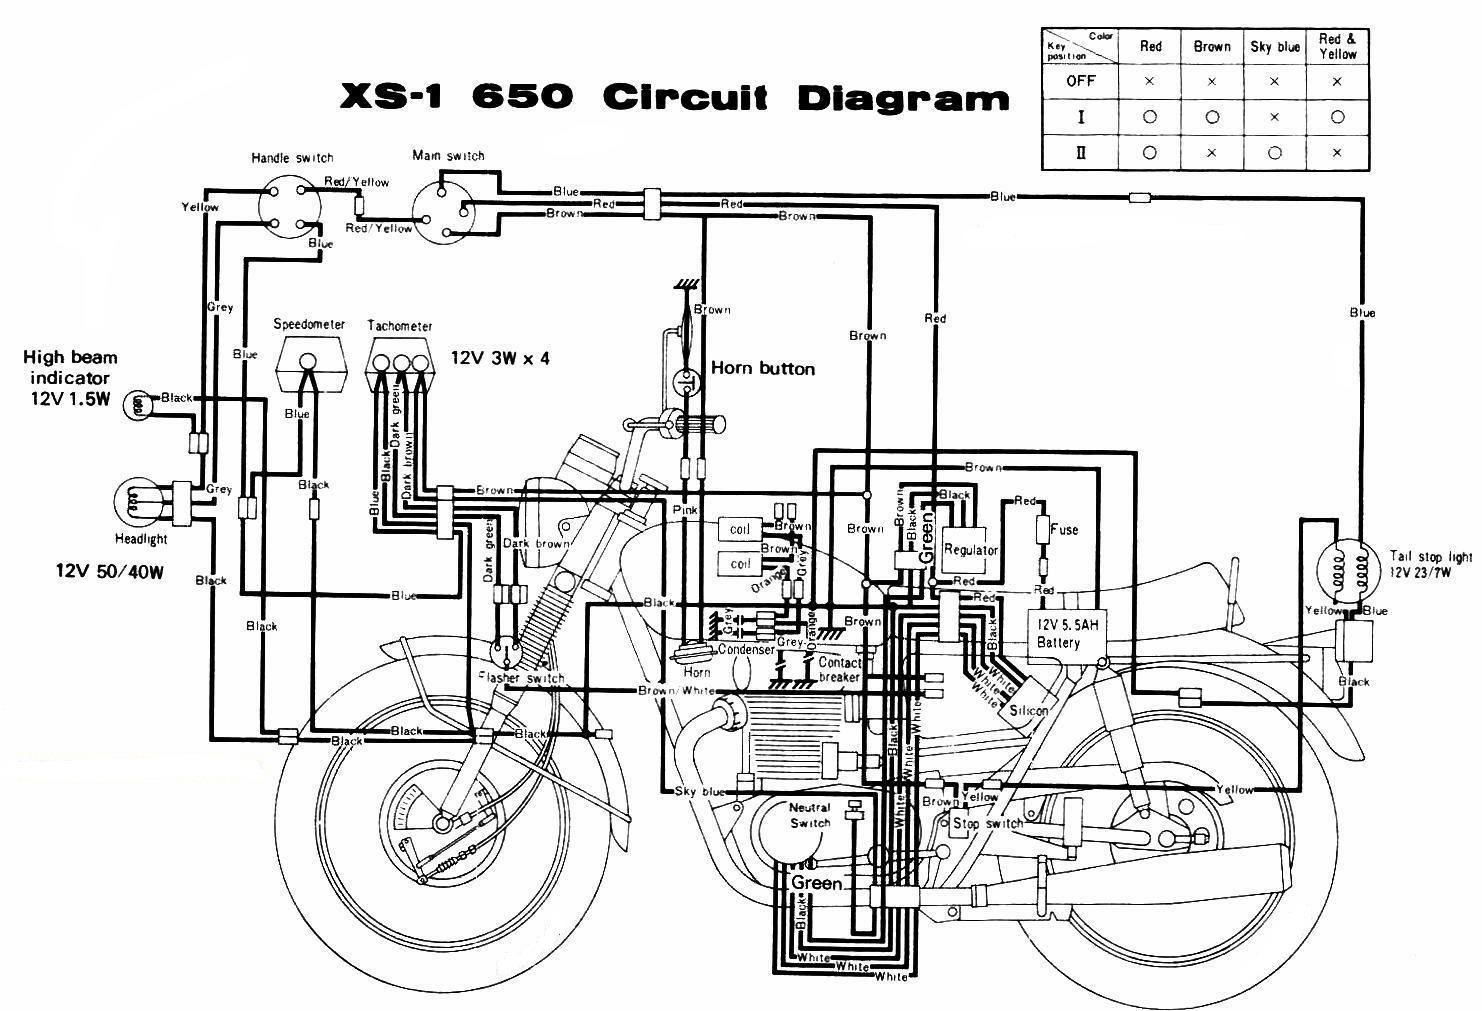 Honda Motorcycle Electrical Wiring Diagram | Manual E-Books - Honda Motorcycle Wiring Diagram